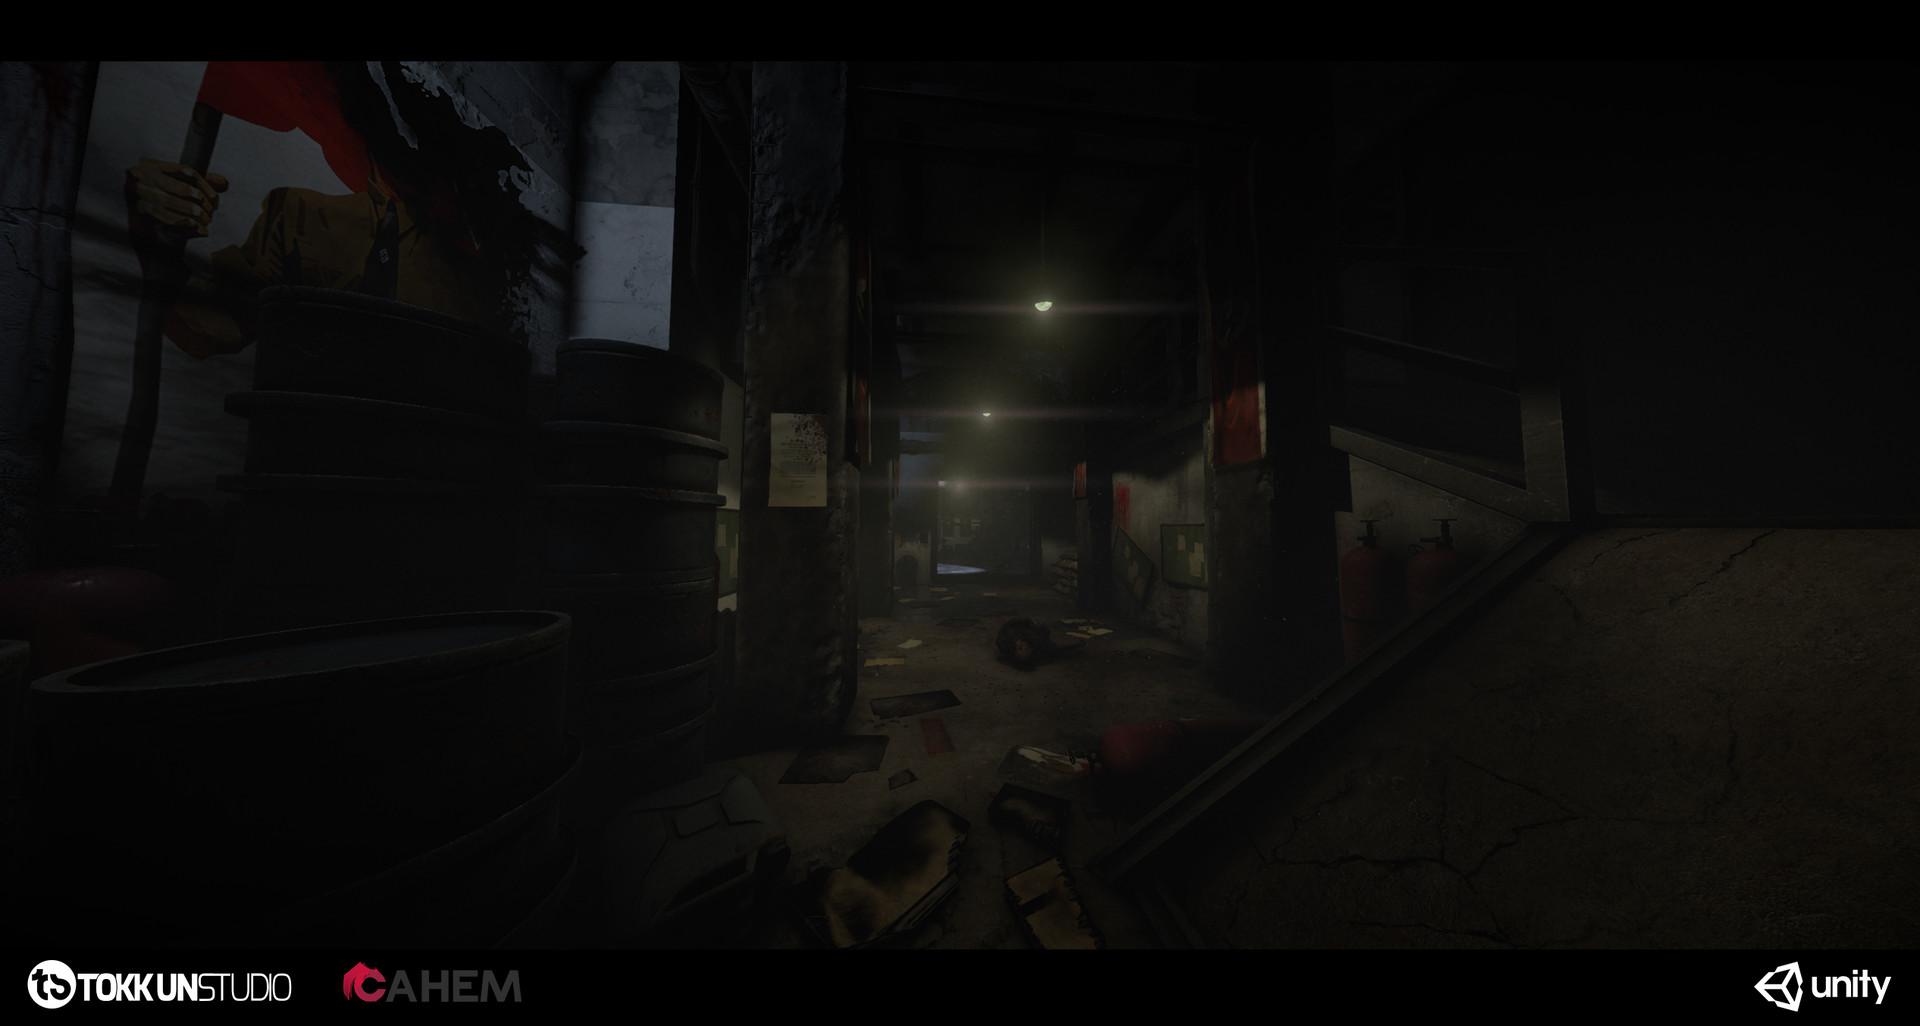 Tokkun studio bunker shot 39